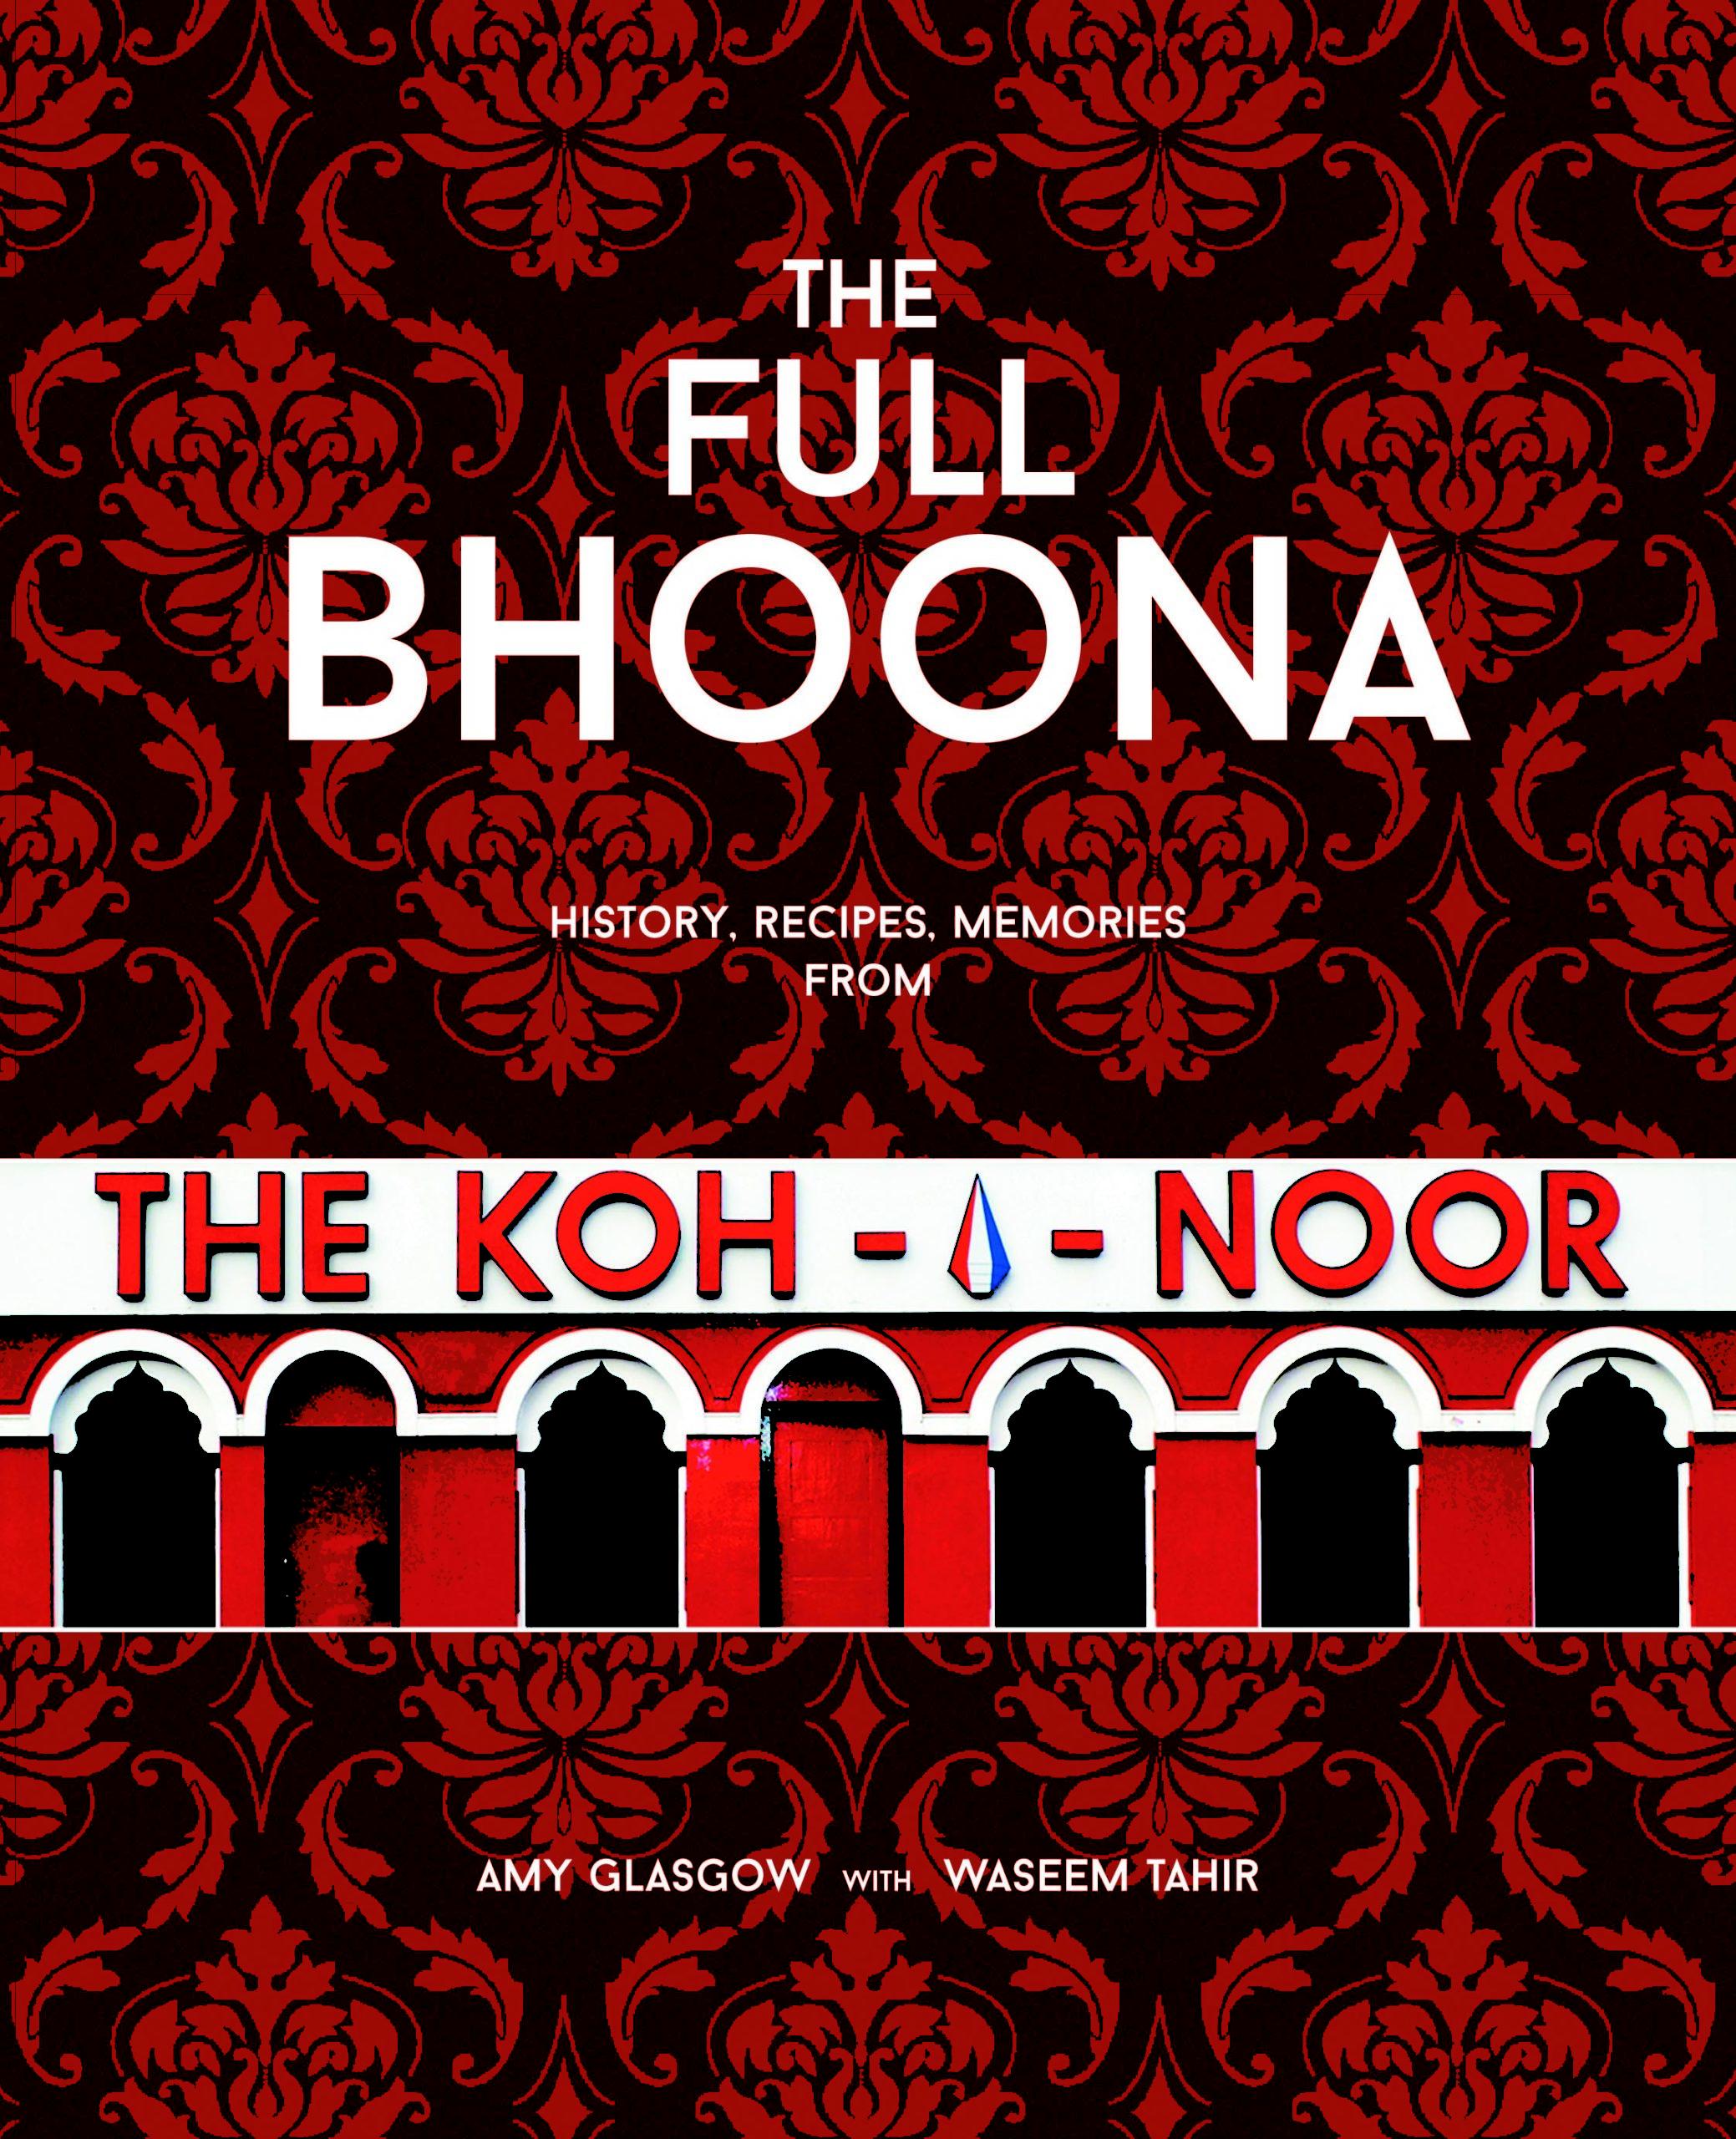 The Full Bhoona